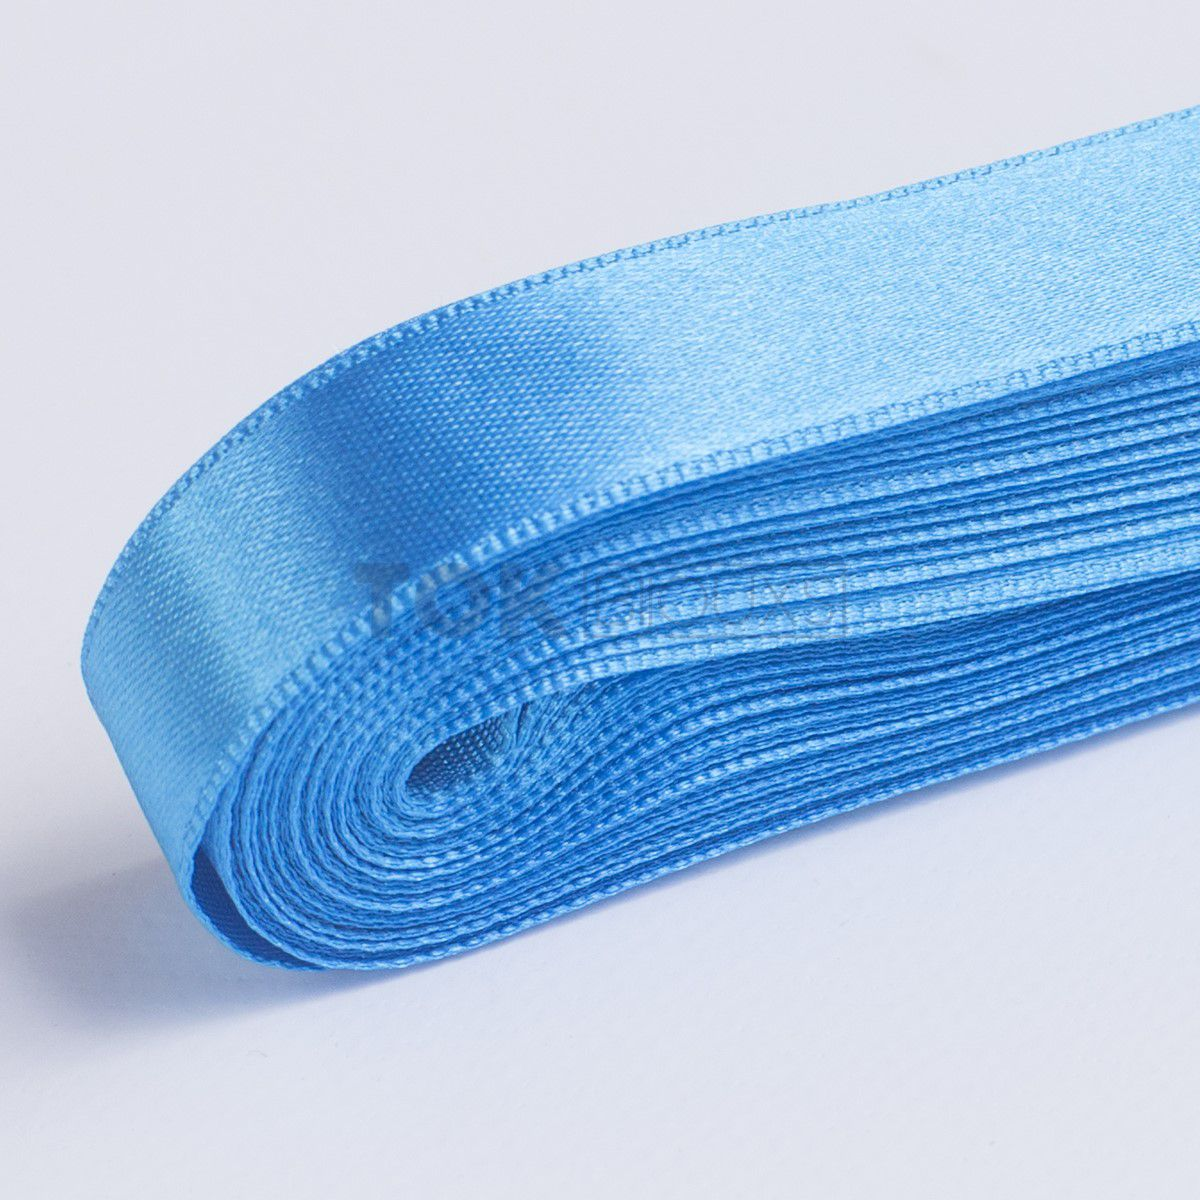 Fita Cetim N.3 - 15mm - 10 Metros - COR (21) Azul Turquesa